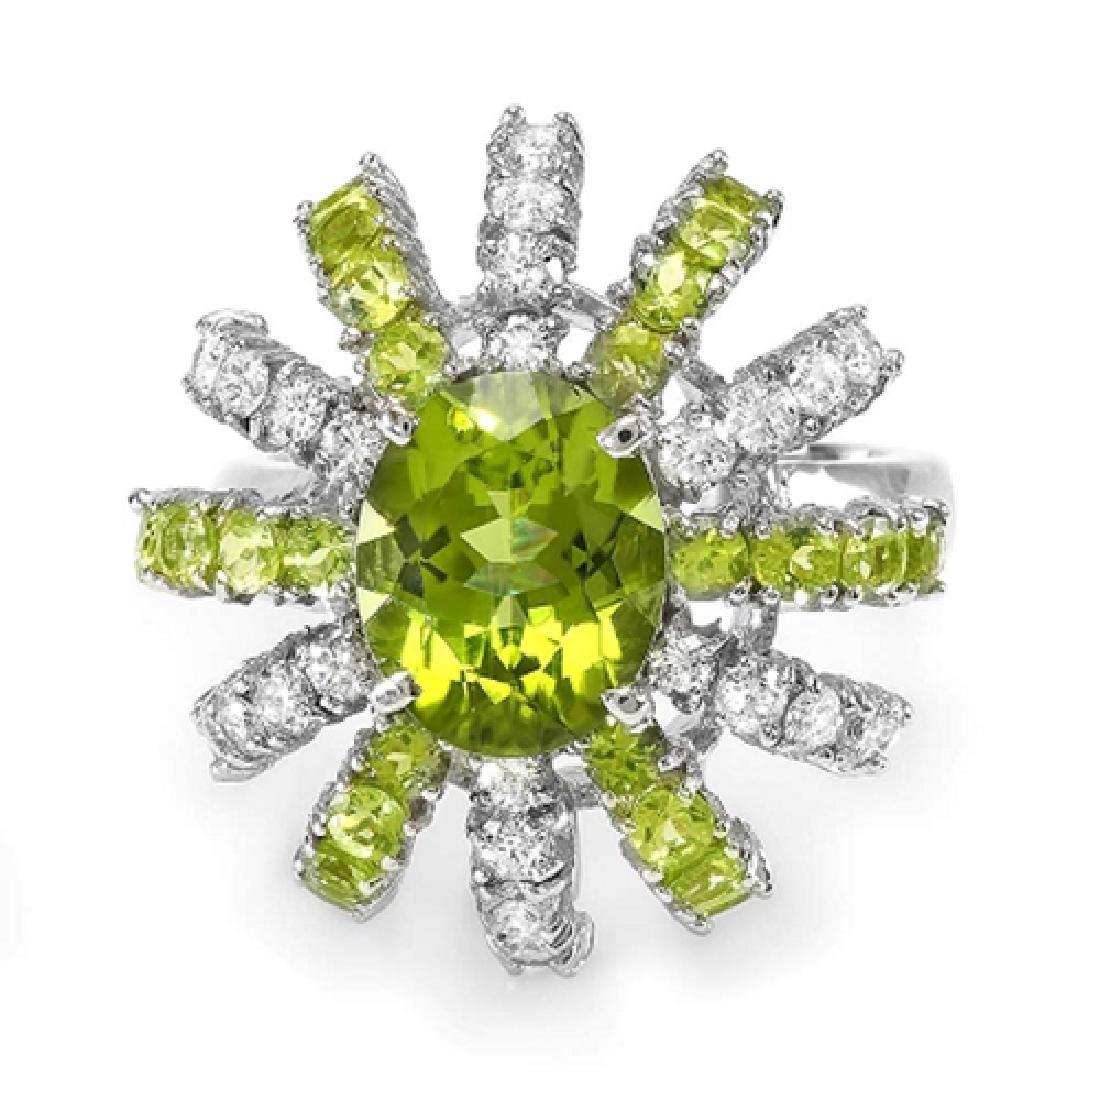 4.80 Carat Natural Peridot 18K Solid White Gold Diamond